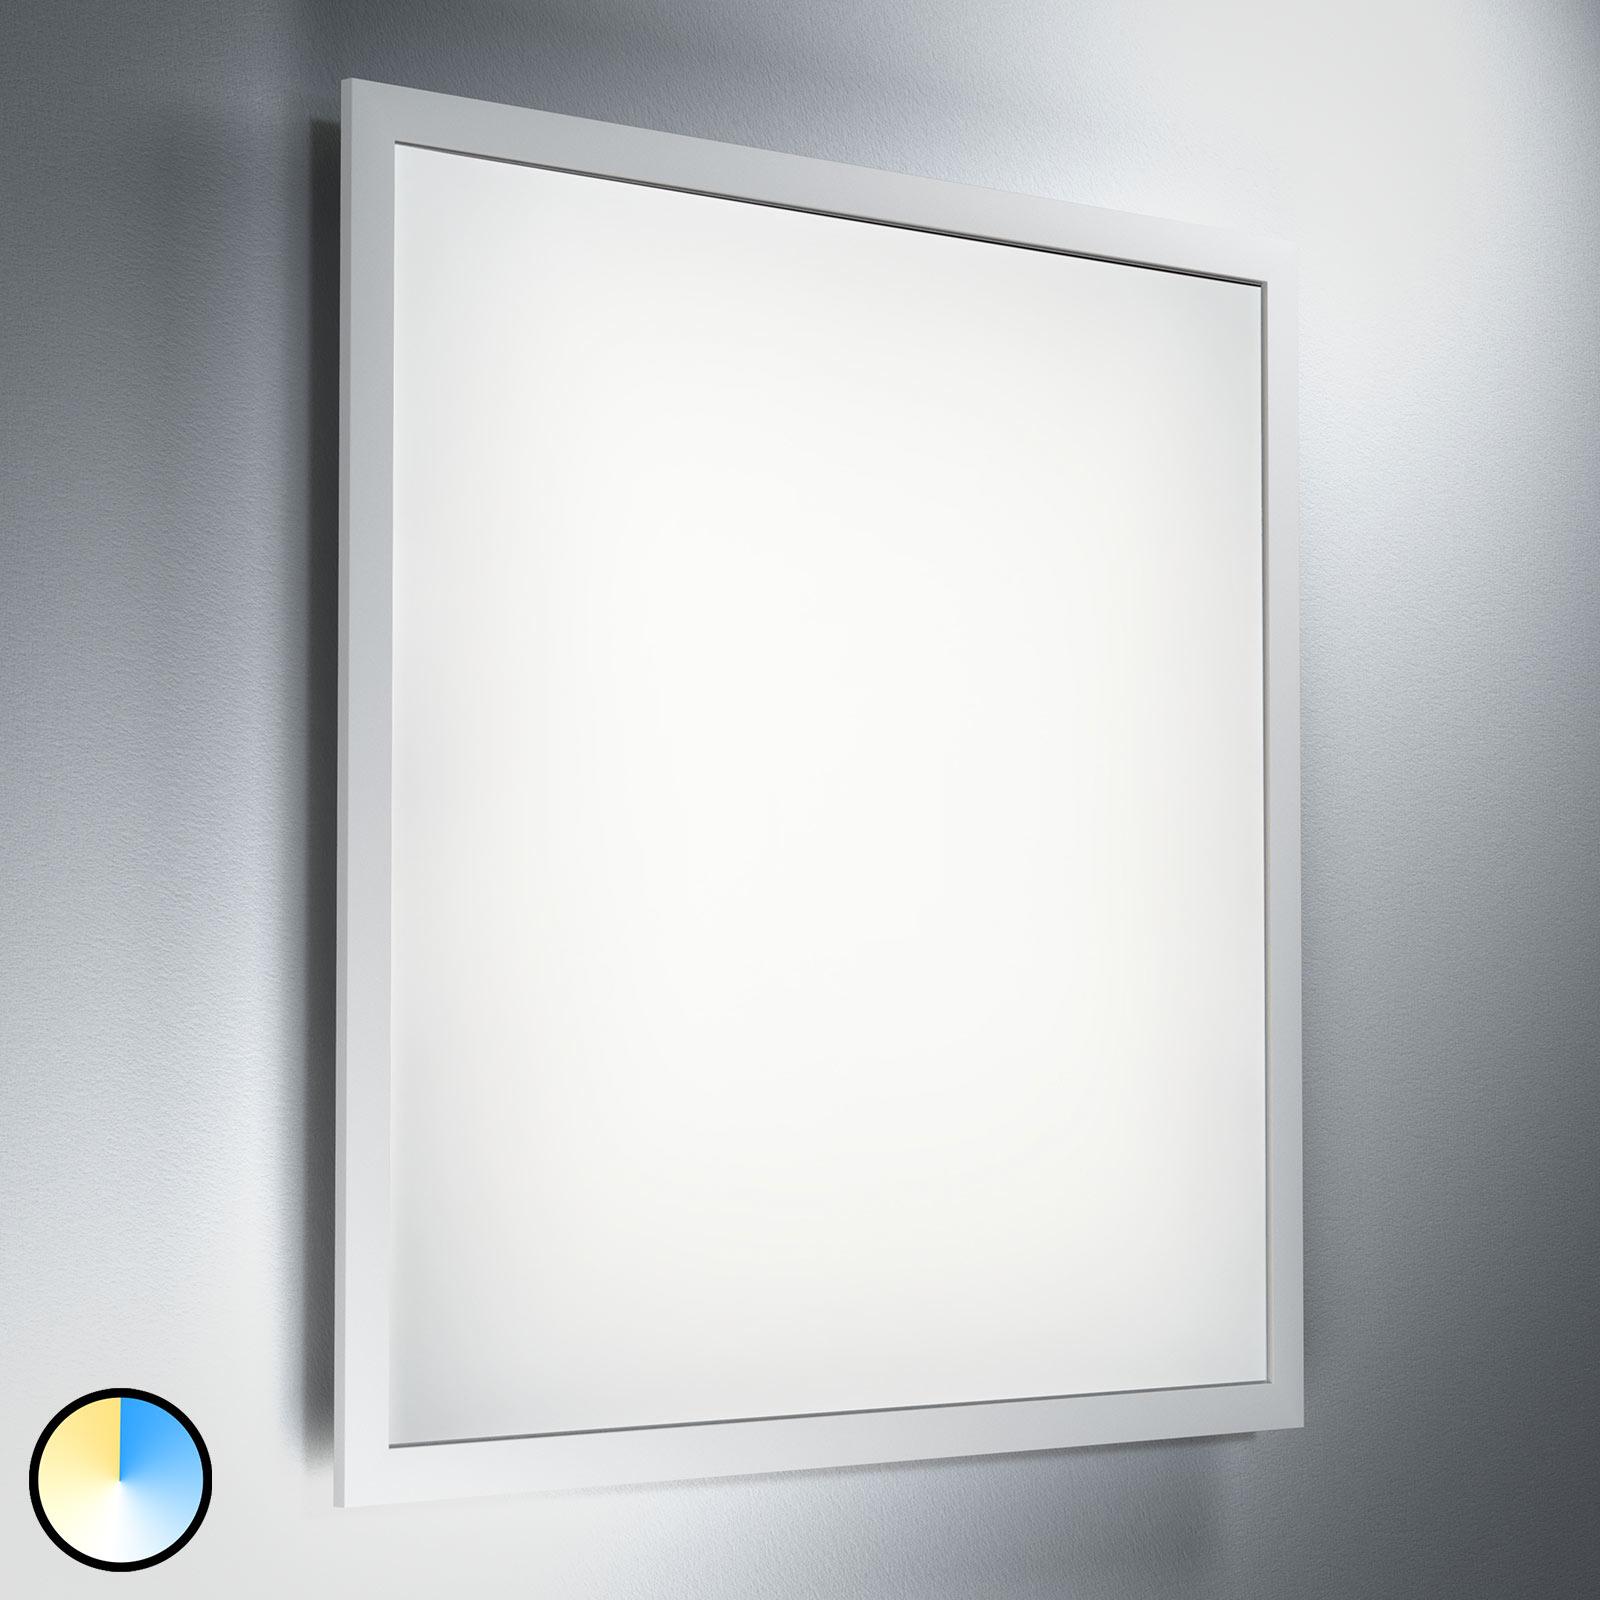 LEDVANCE SMART+ ZigBee pann. Tunable White 60x60cm